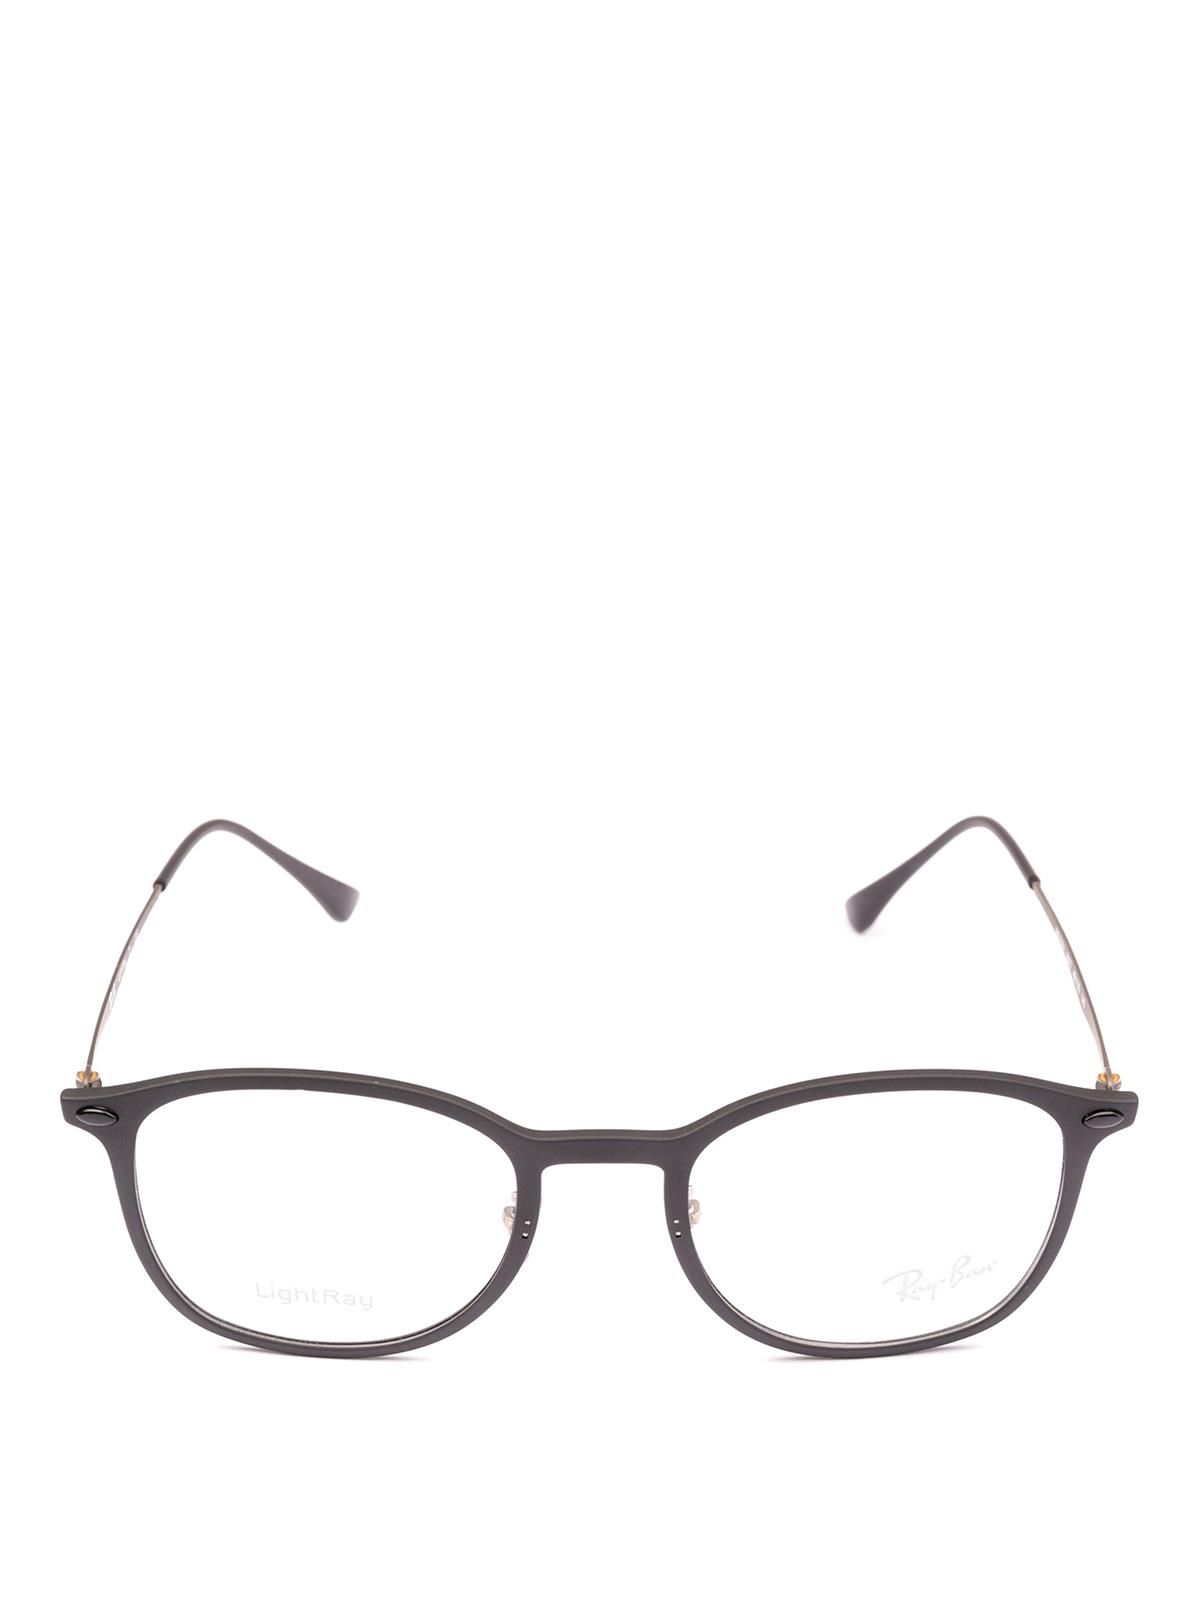 ac3cd3d34e Ray Ban - Black acetate frame squared glasses - glasses - RB7051 2077